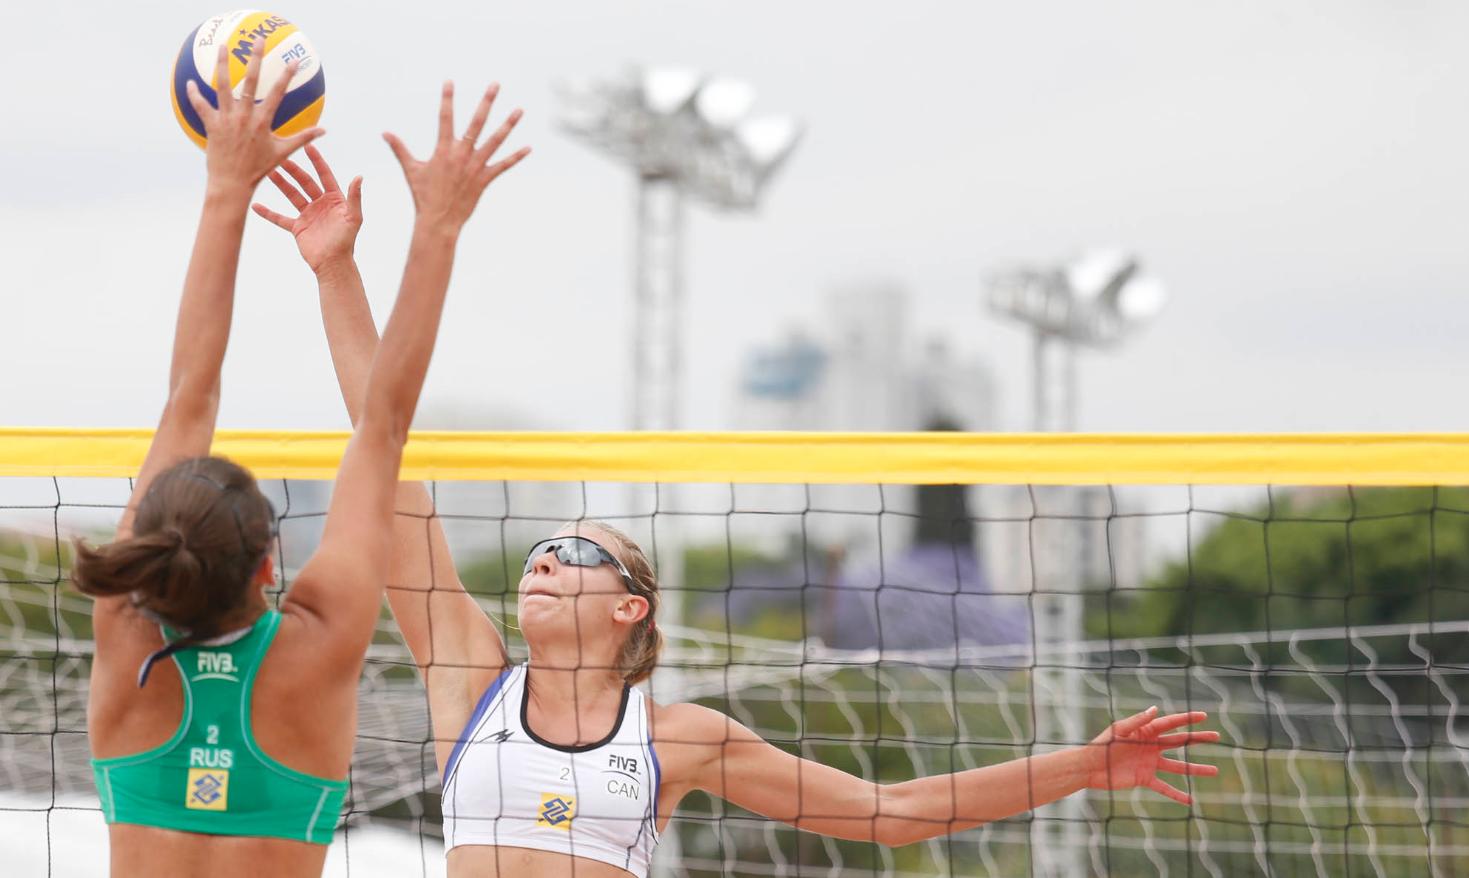 Kristina Valjas wipes off the block in Sao Paulo. Photo: FIVB.